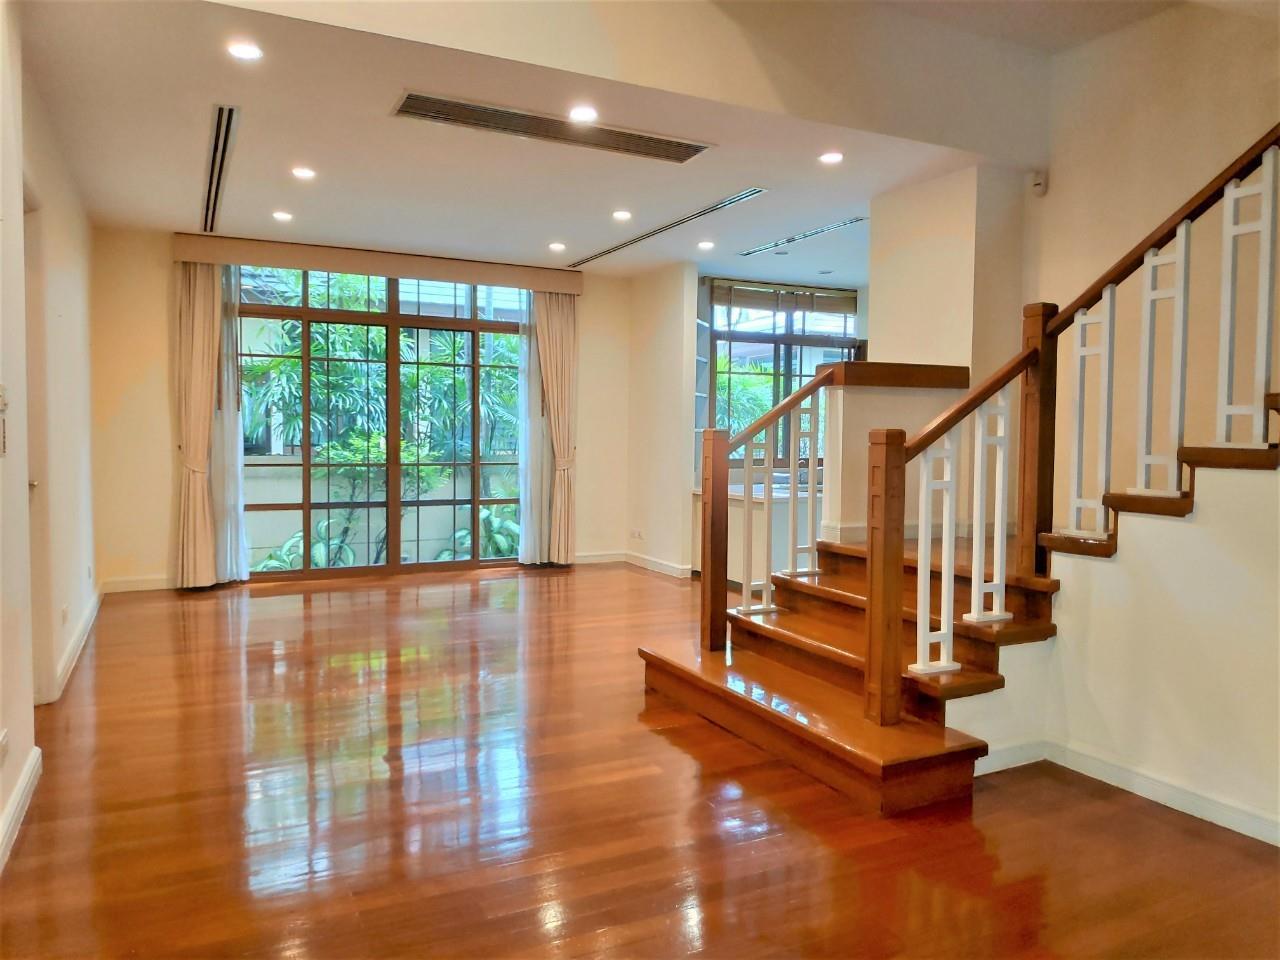 Agent - Natchga Boonkrong  Agency's For Rent House 4 Bedrooms Baan Sansiri Sukhumvit 67 16